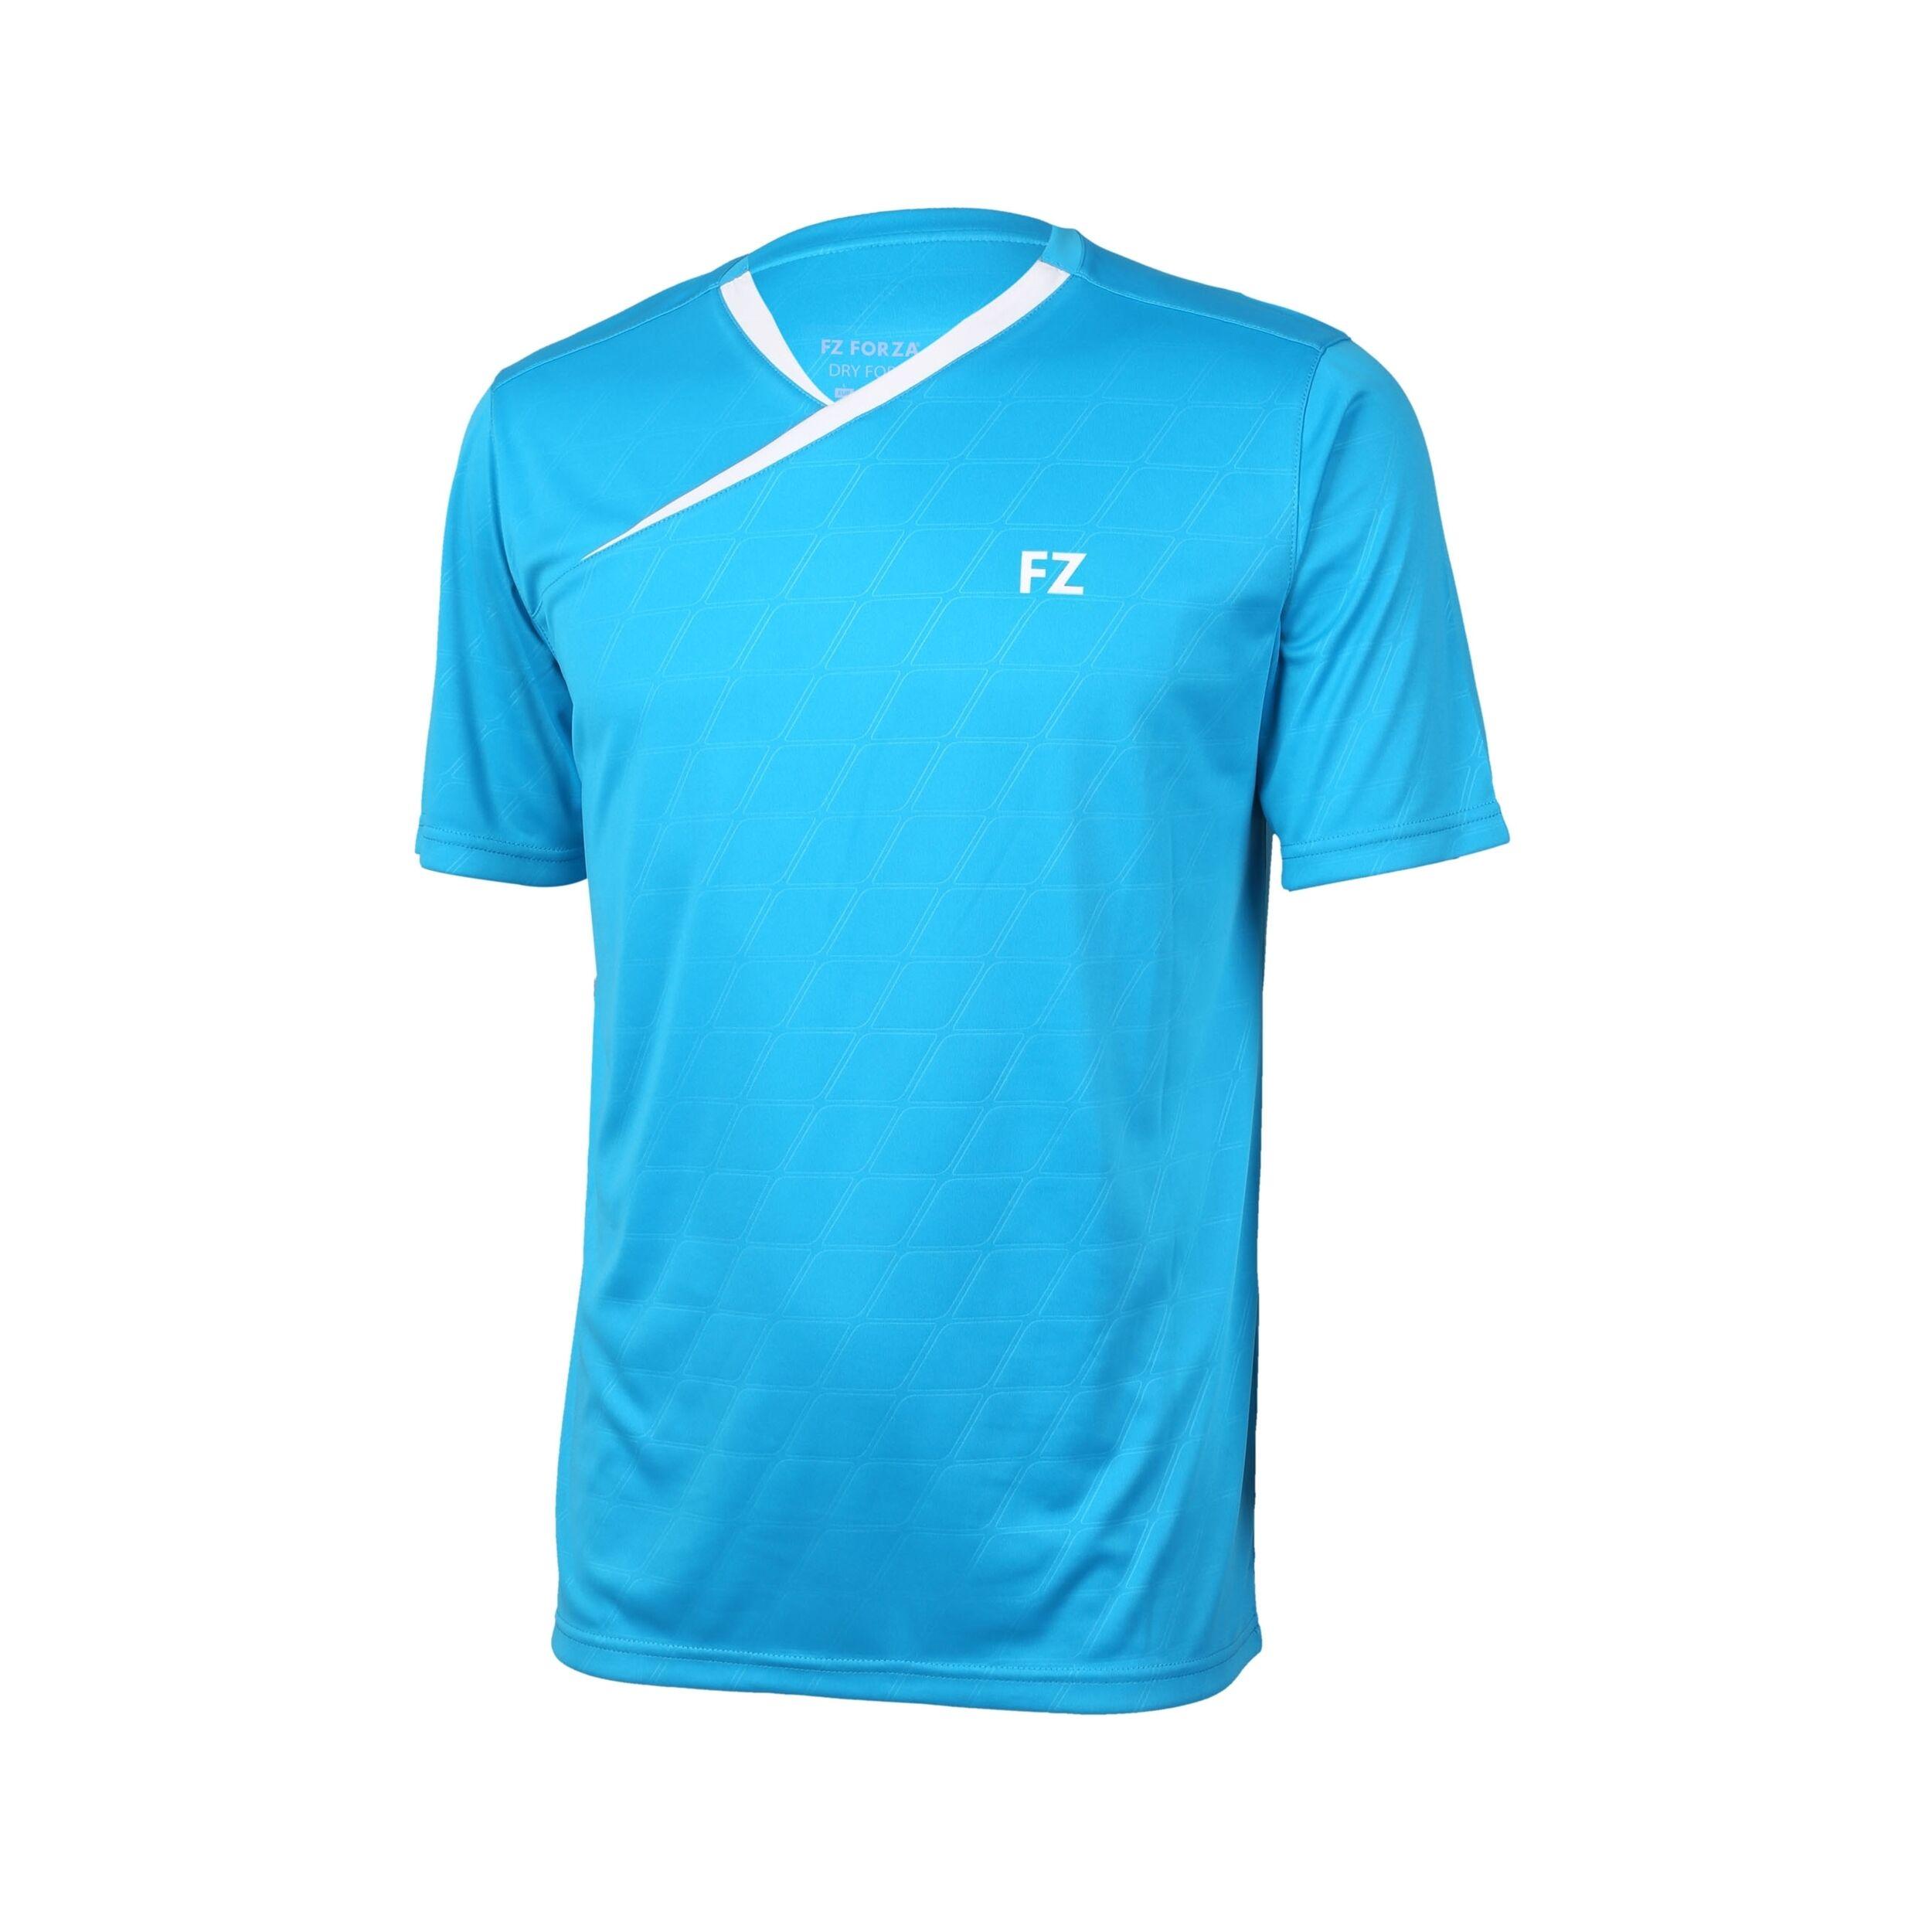 FZ Forza Byron T-shirt Atomic Teal M